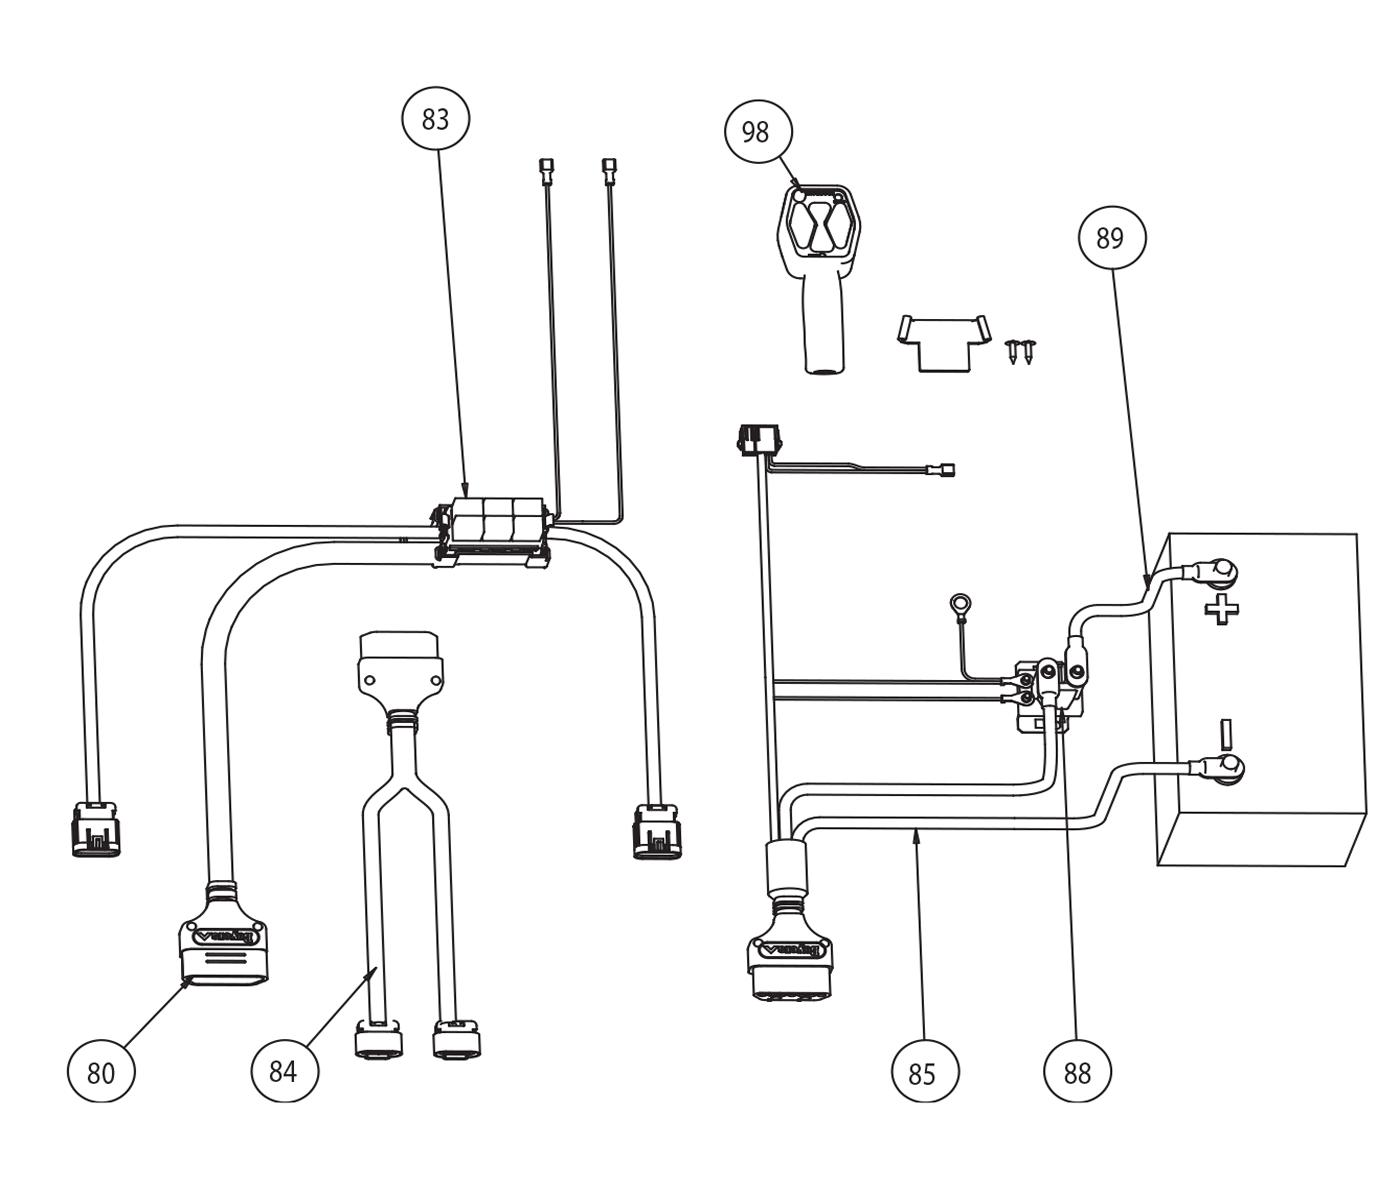 snowdogg plow wiring harness wiring diagram third level rh 15 4 14 jacobwinterstein com meyer plow [ 1400 x 1200 Pixel ]